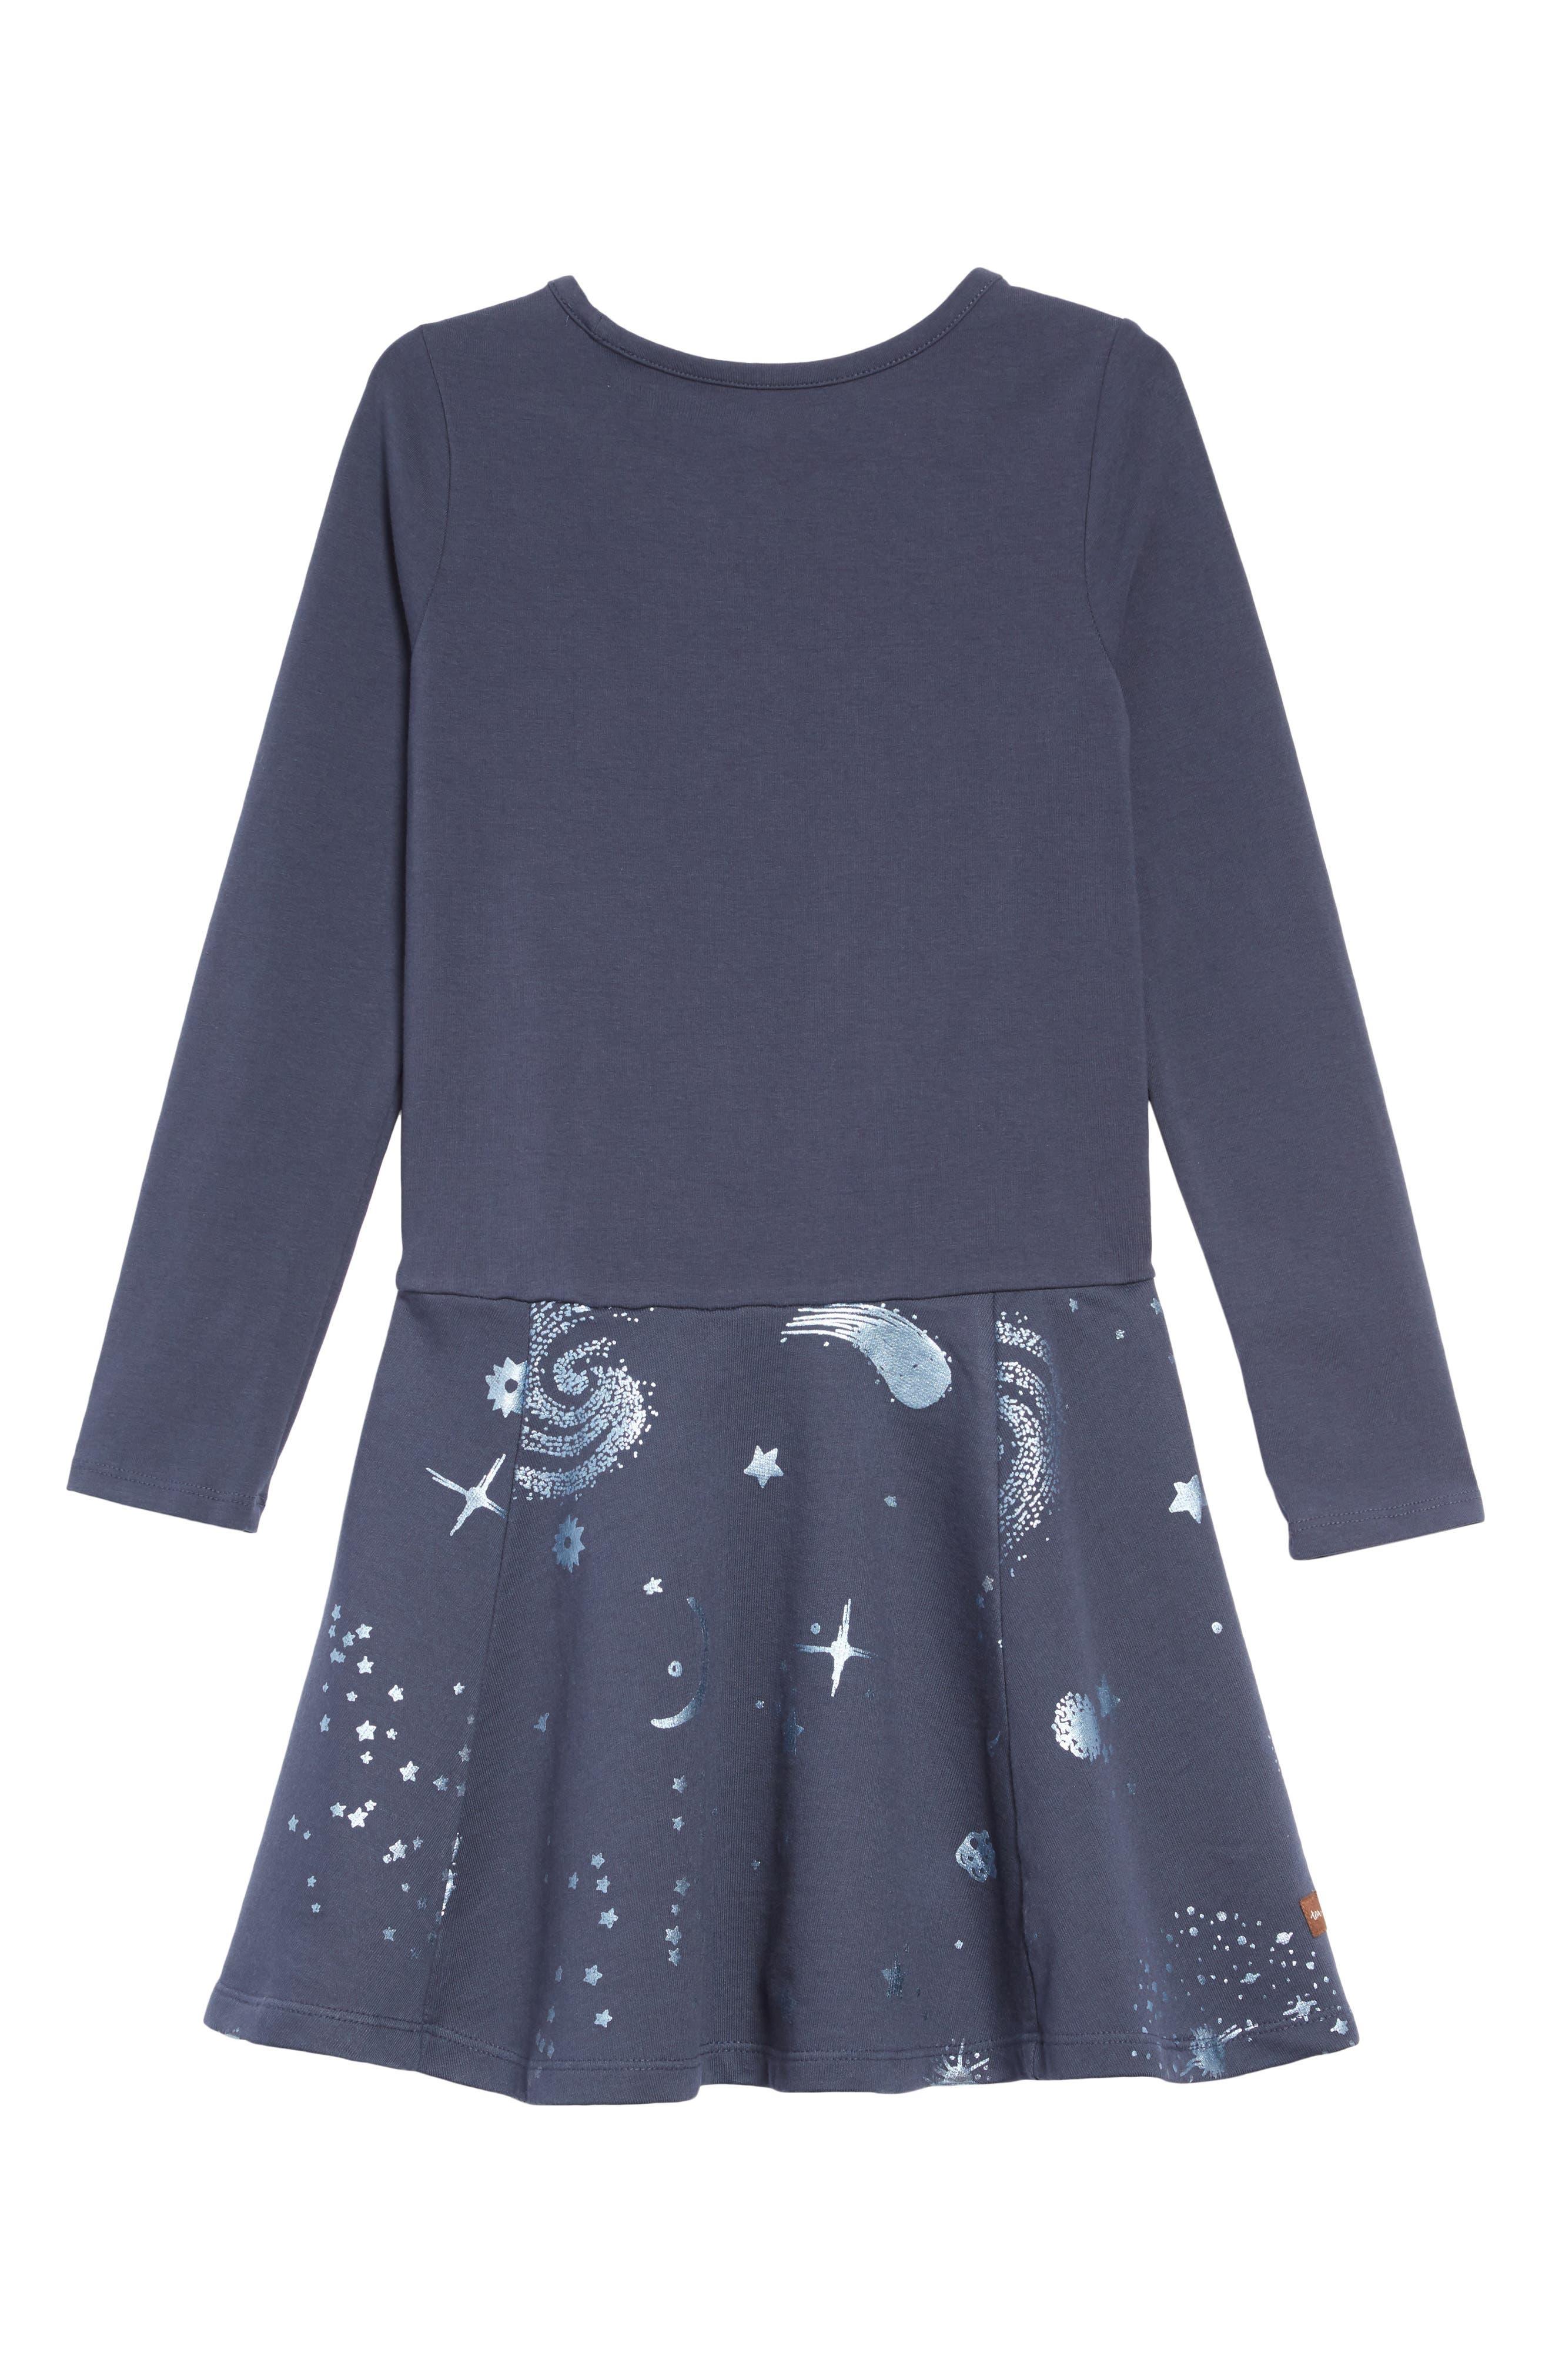 Starry Skies Dress,                             Alternate thumbnail 2, color,                             STARRY SKIES - INDIGO